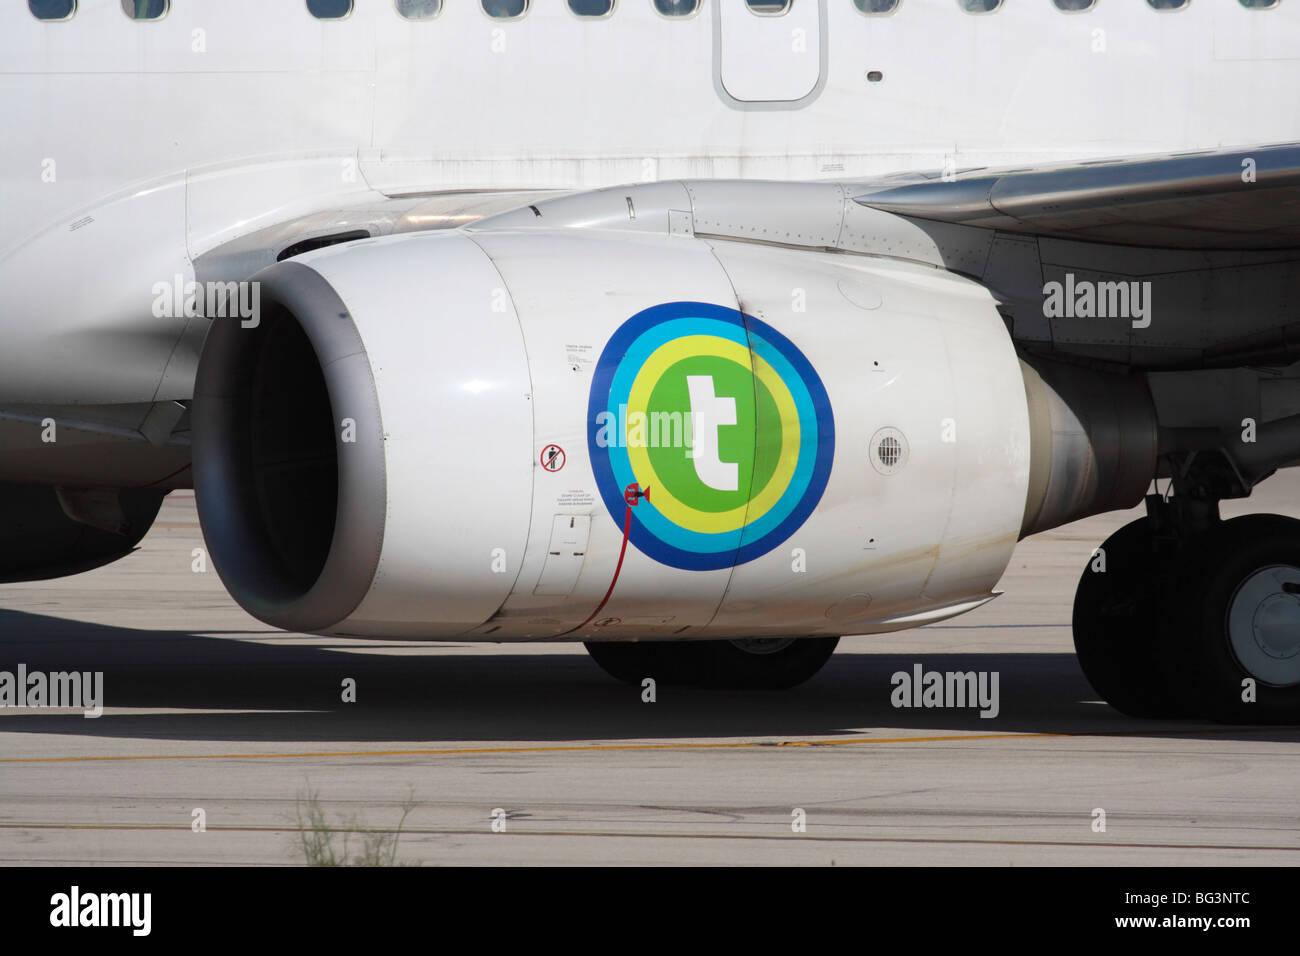 CFM International CFM56 turbofan jet engine nacelle on a Transavia Boeing 737-700 commercial passenger airplane - Stock Image